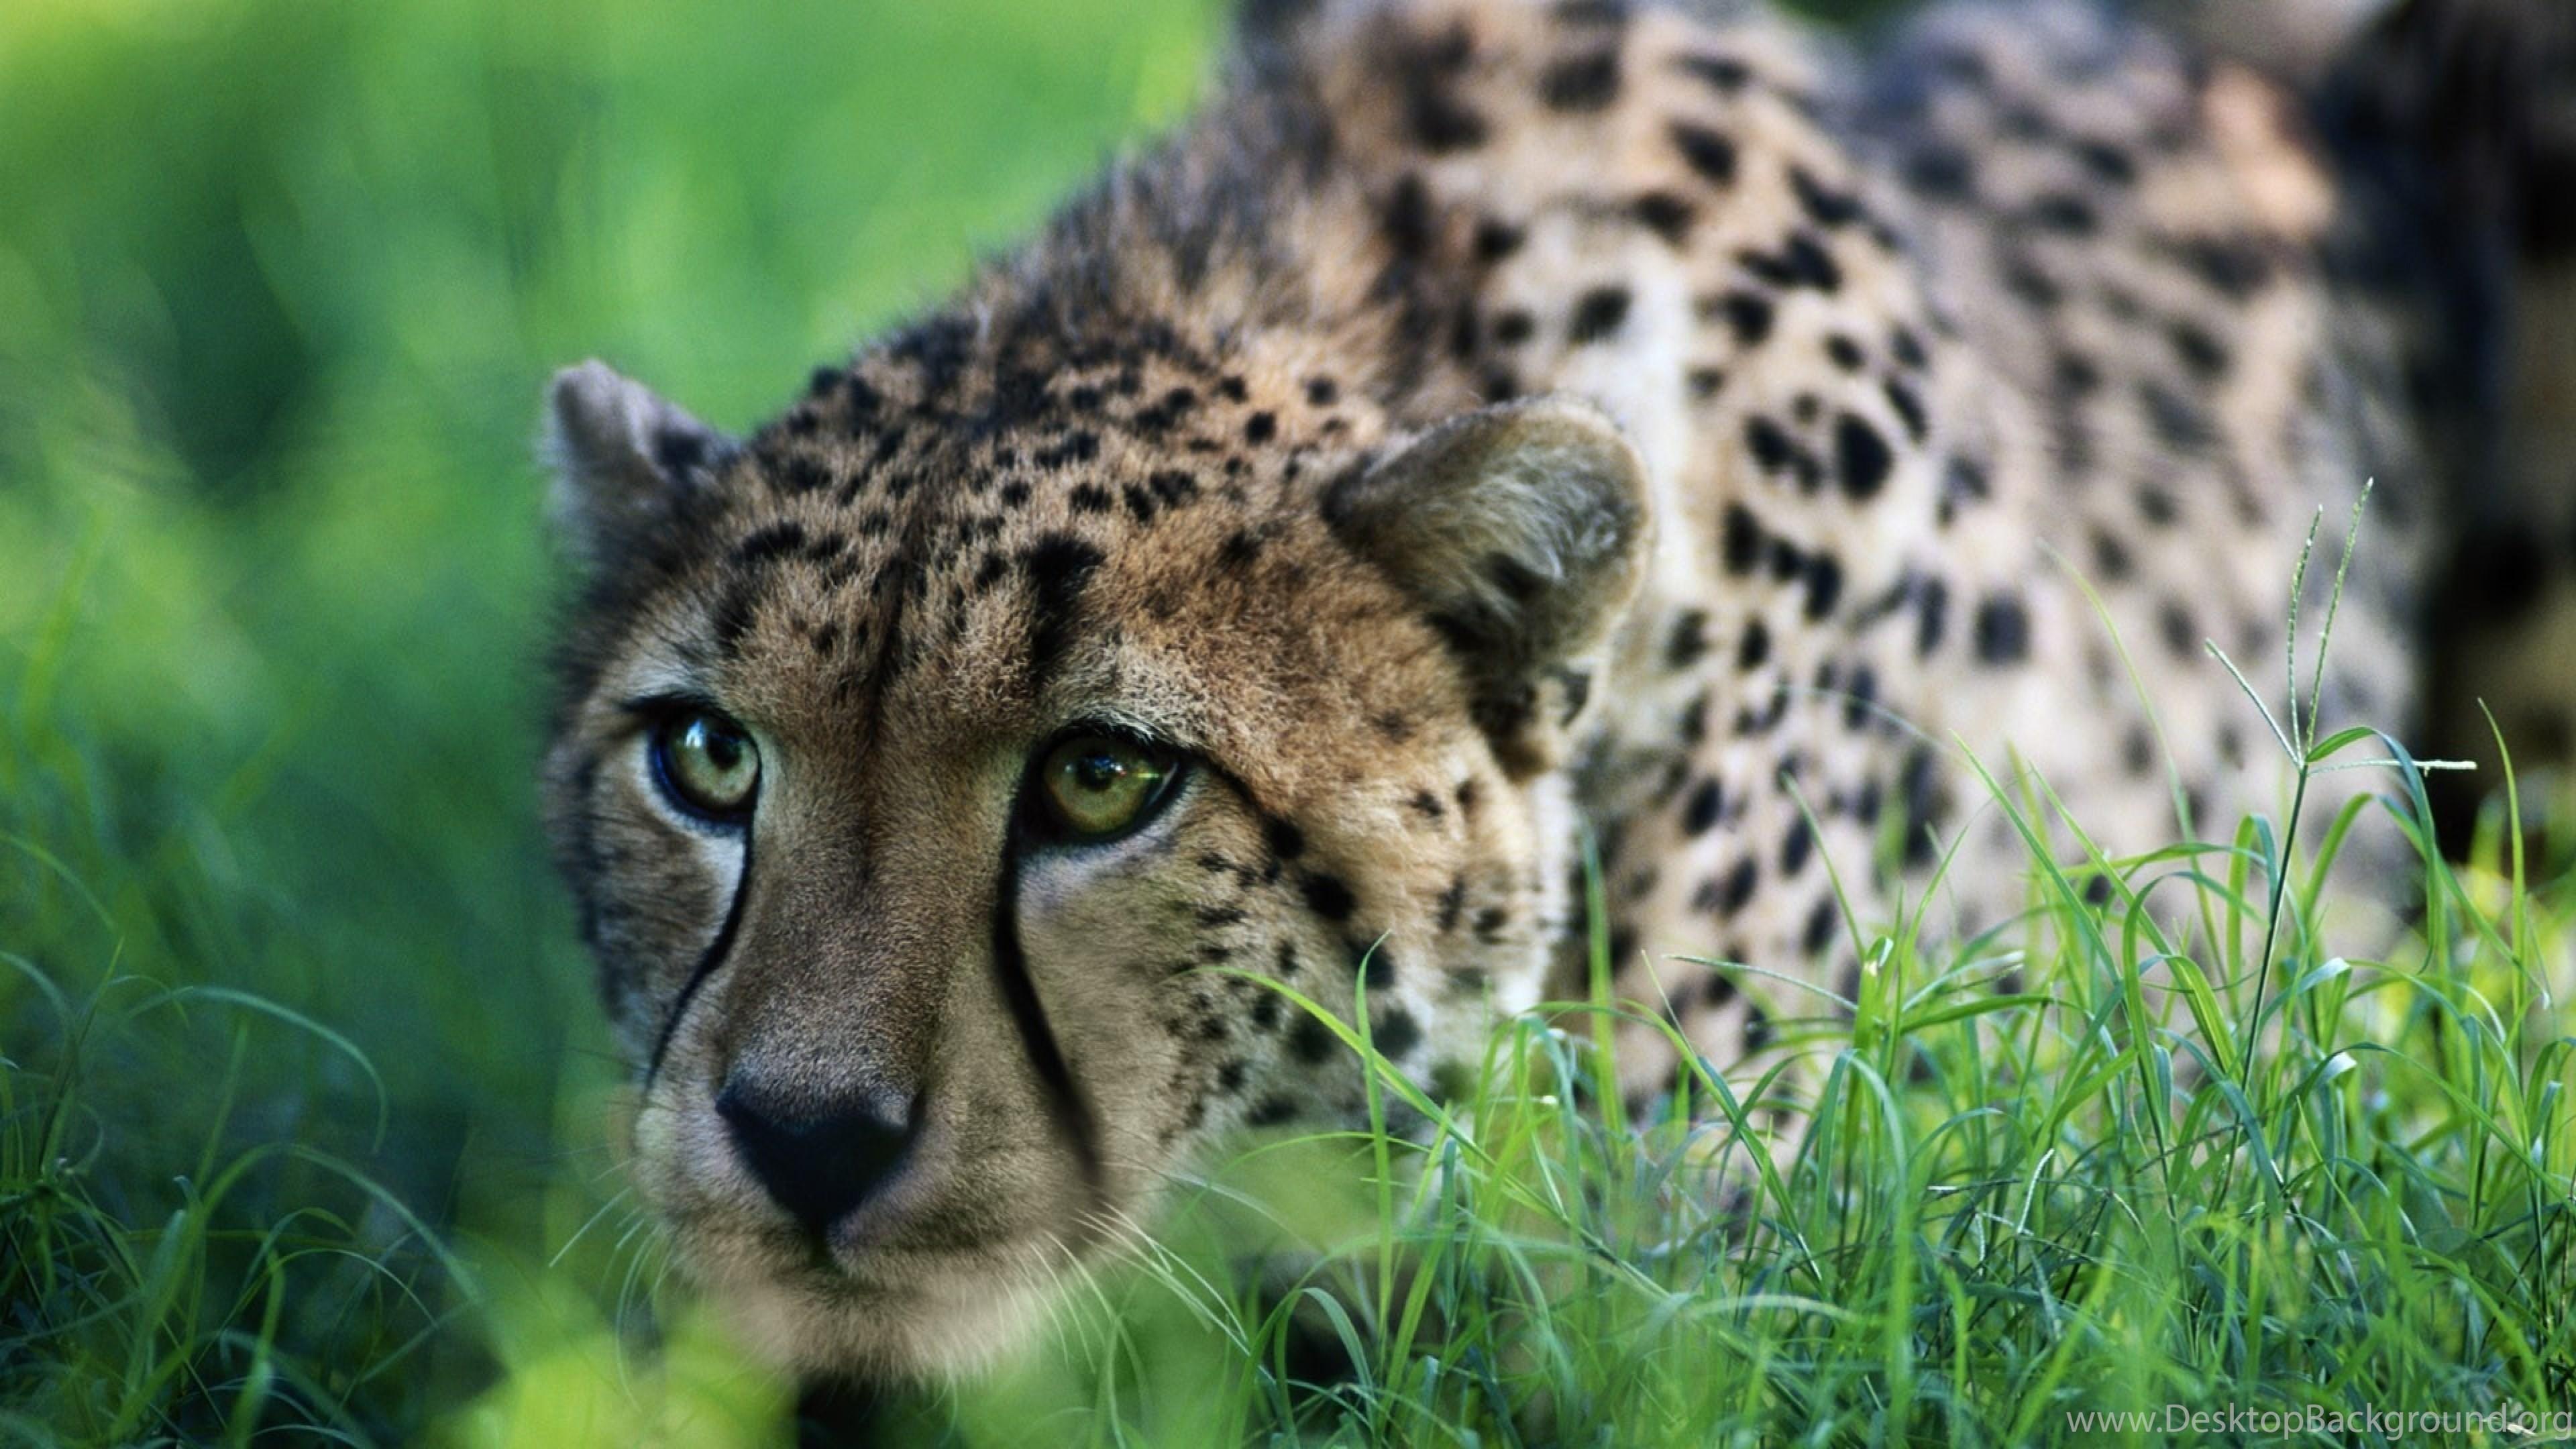 Res: 3840x2160, 4K Ultra HD Cheetah Wallpapers HD, Desktop Backgrounds  .